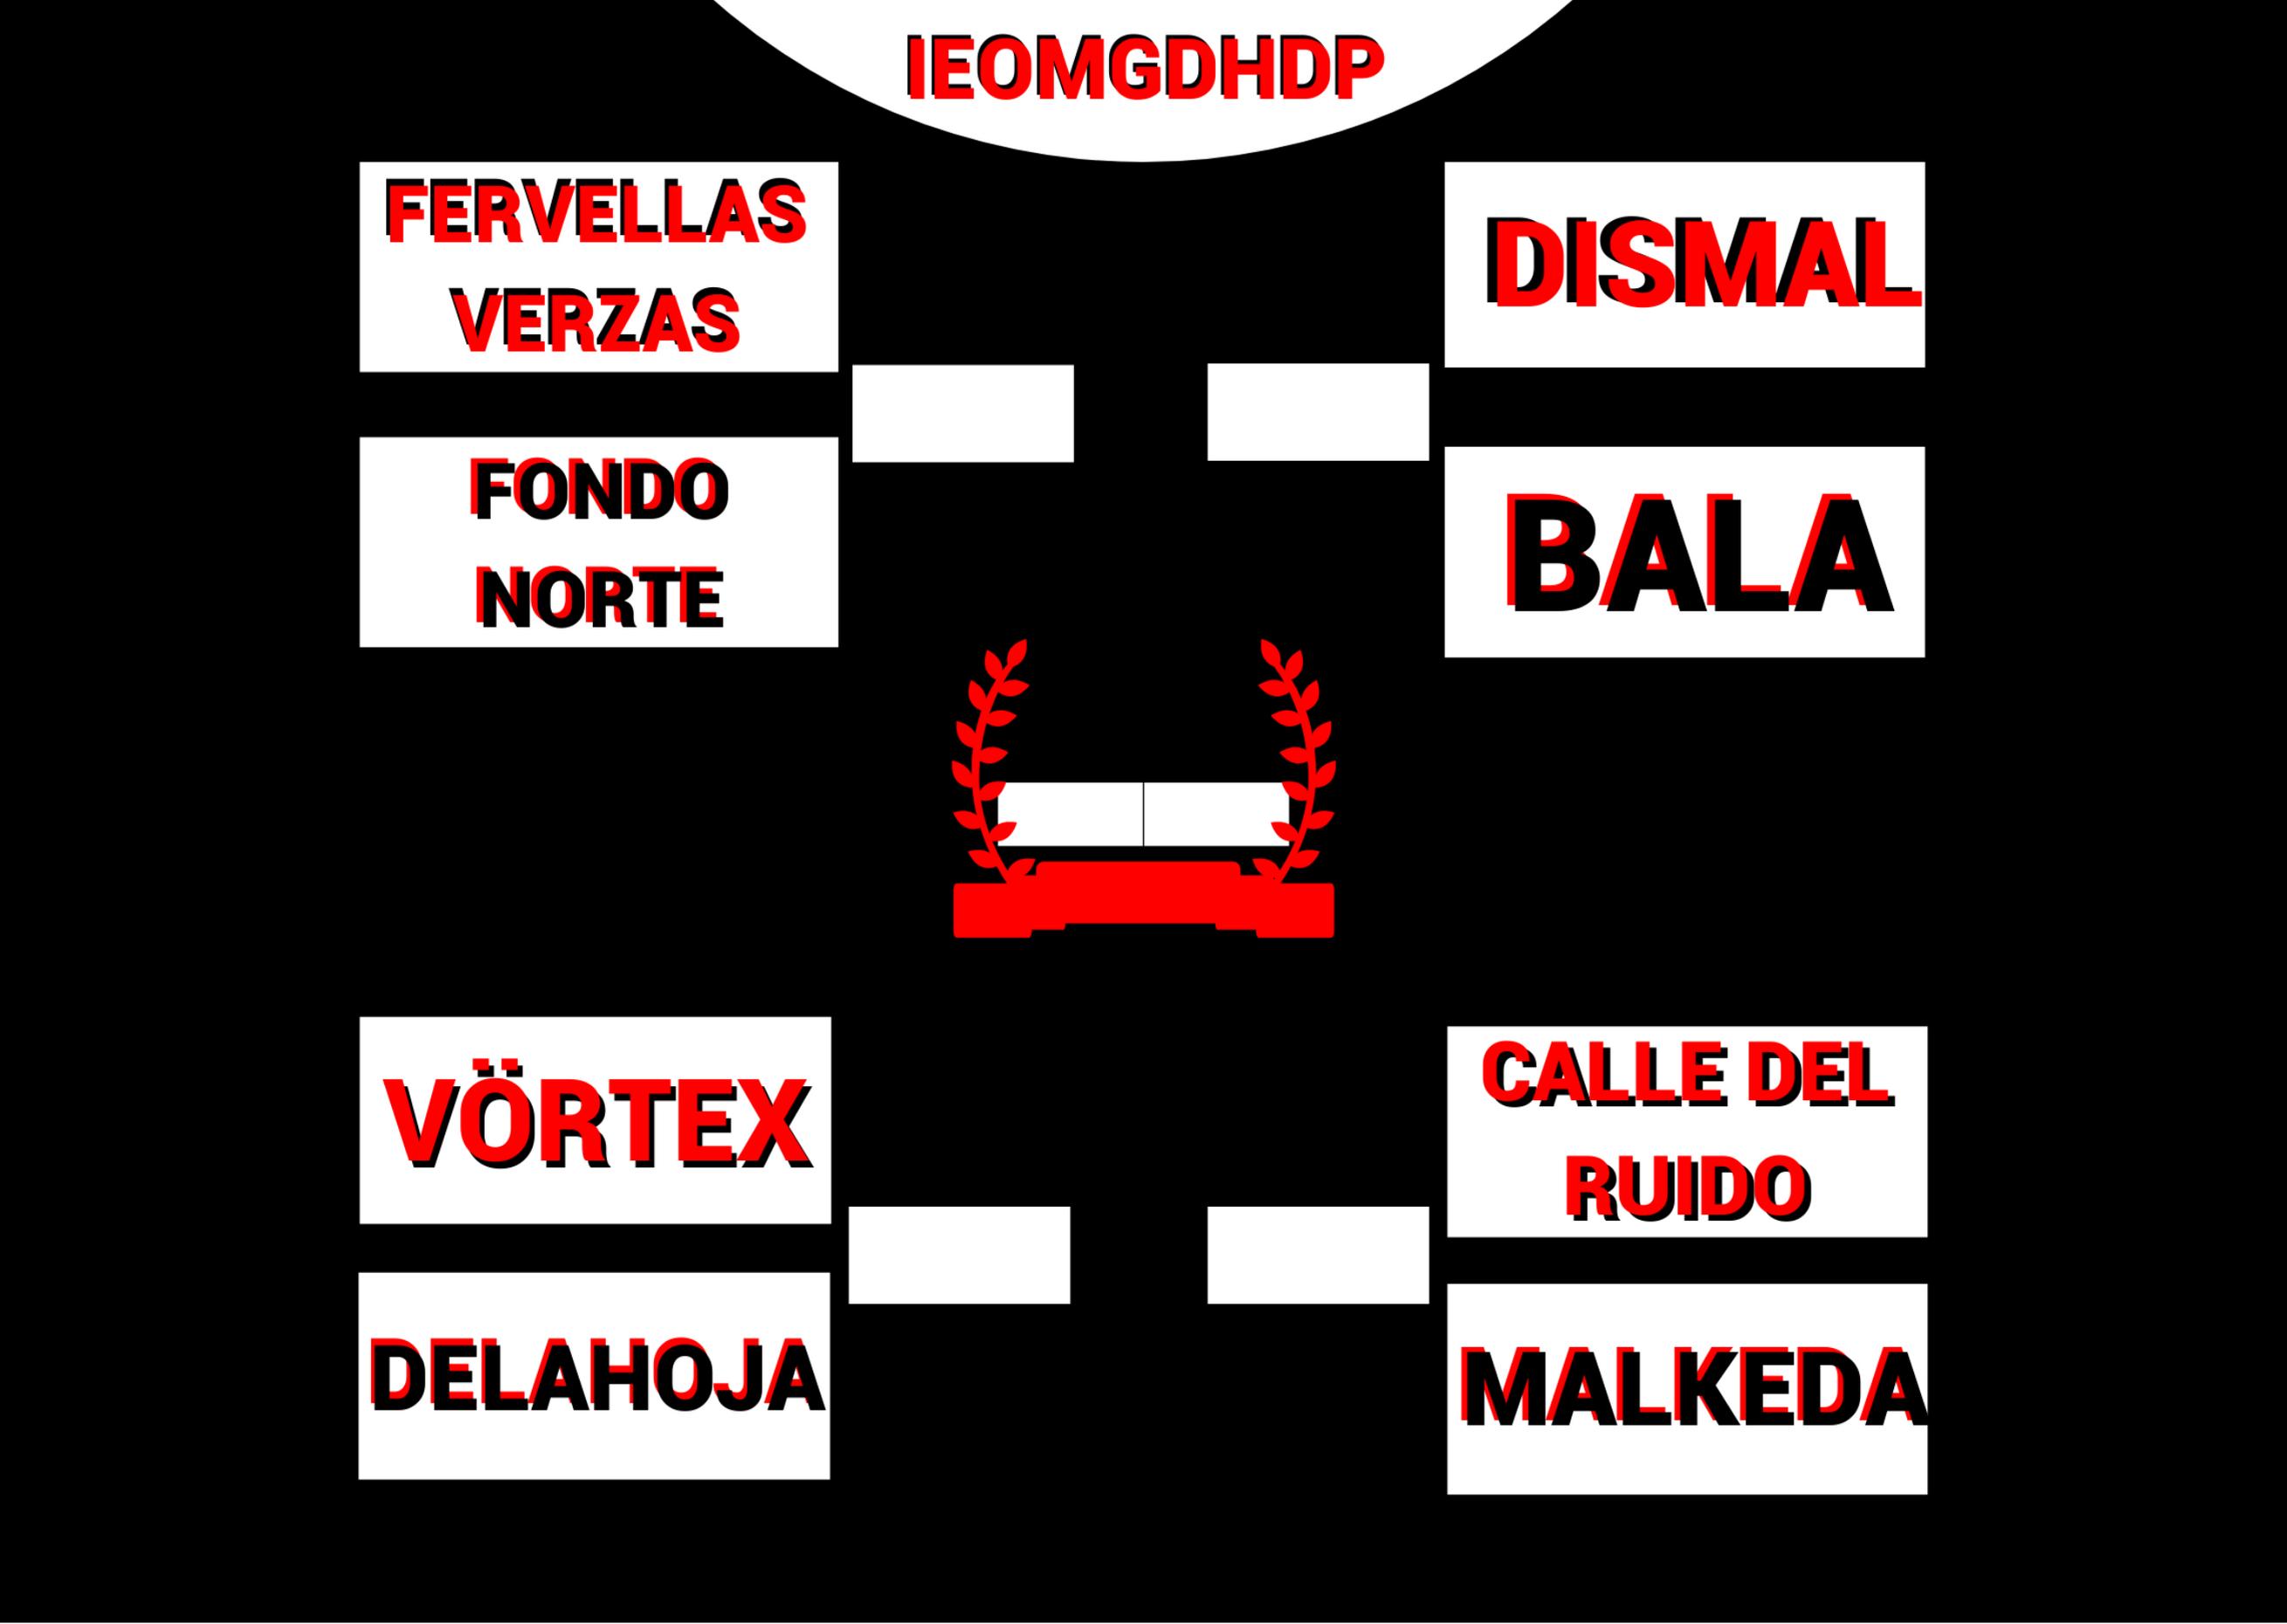 IEOMGDHDP: CUARTOS DE FINAL